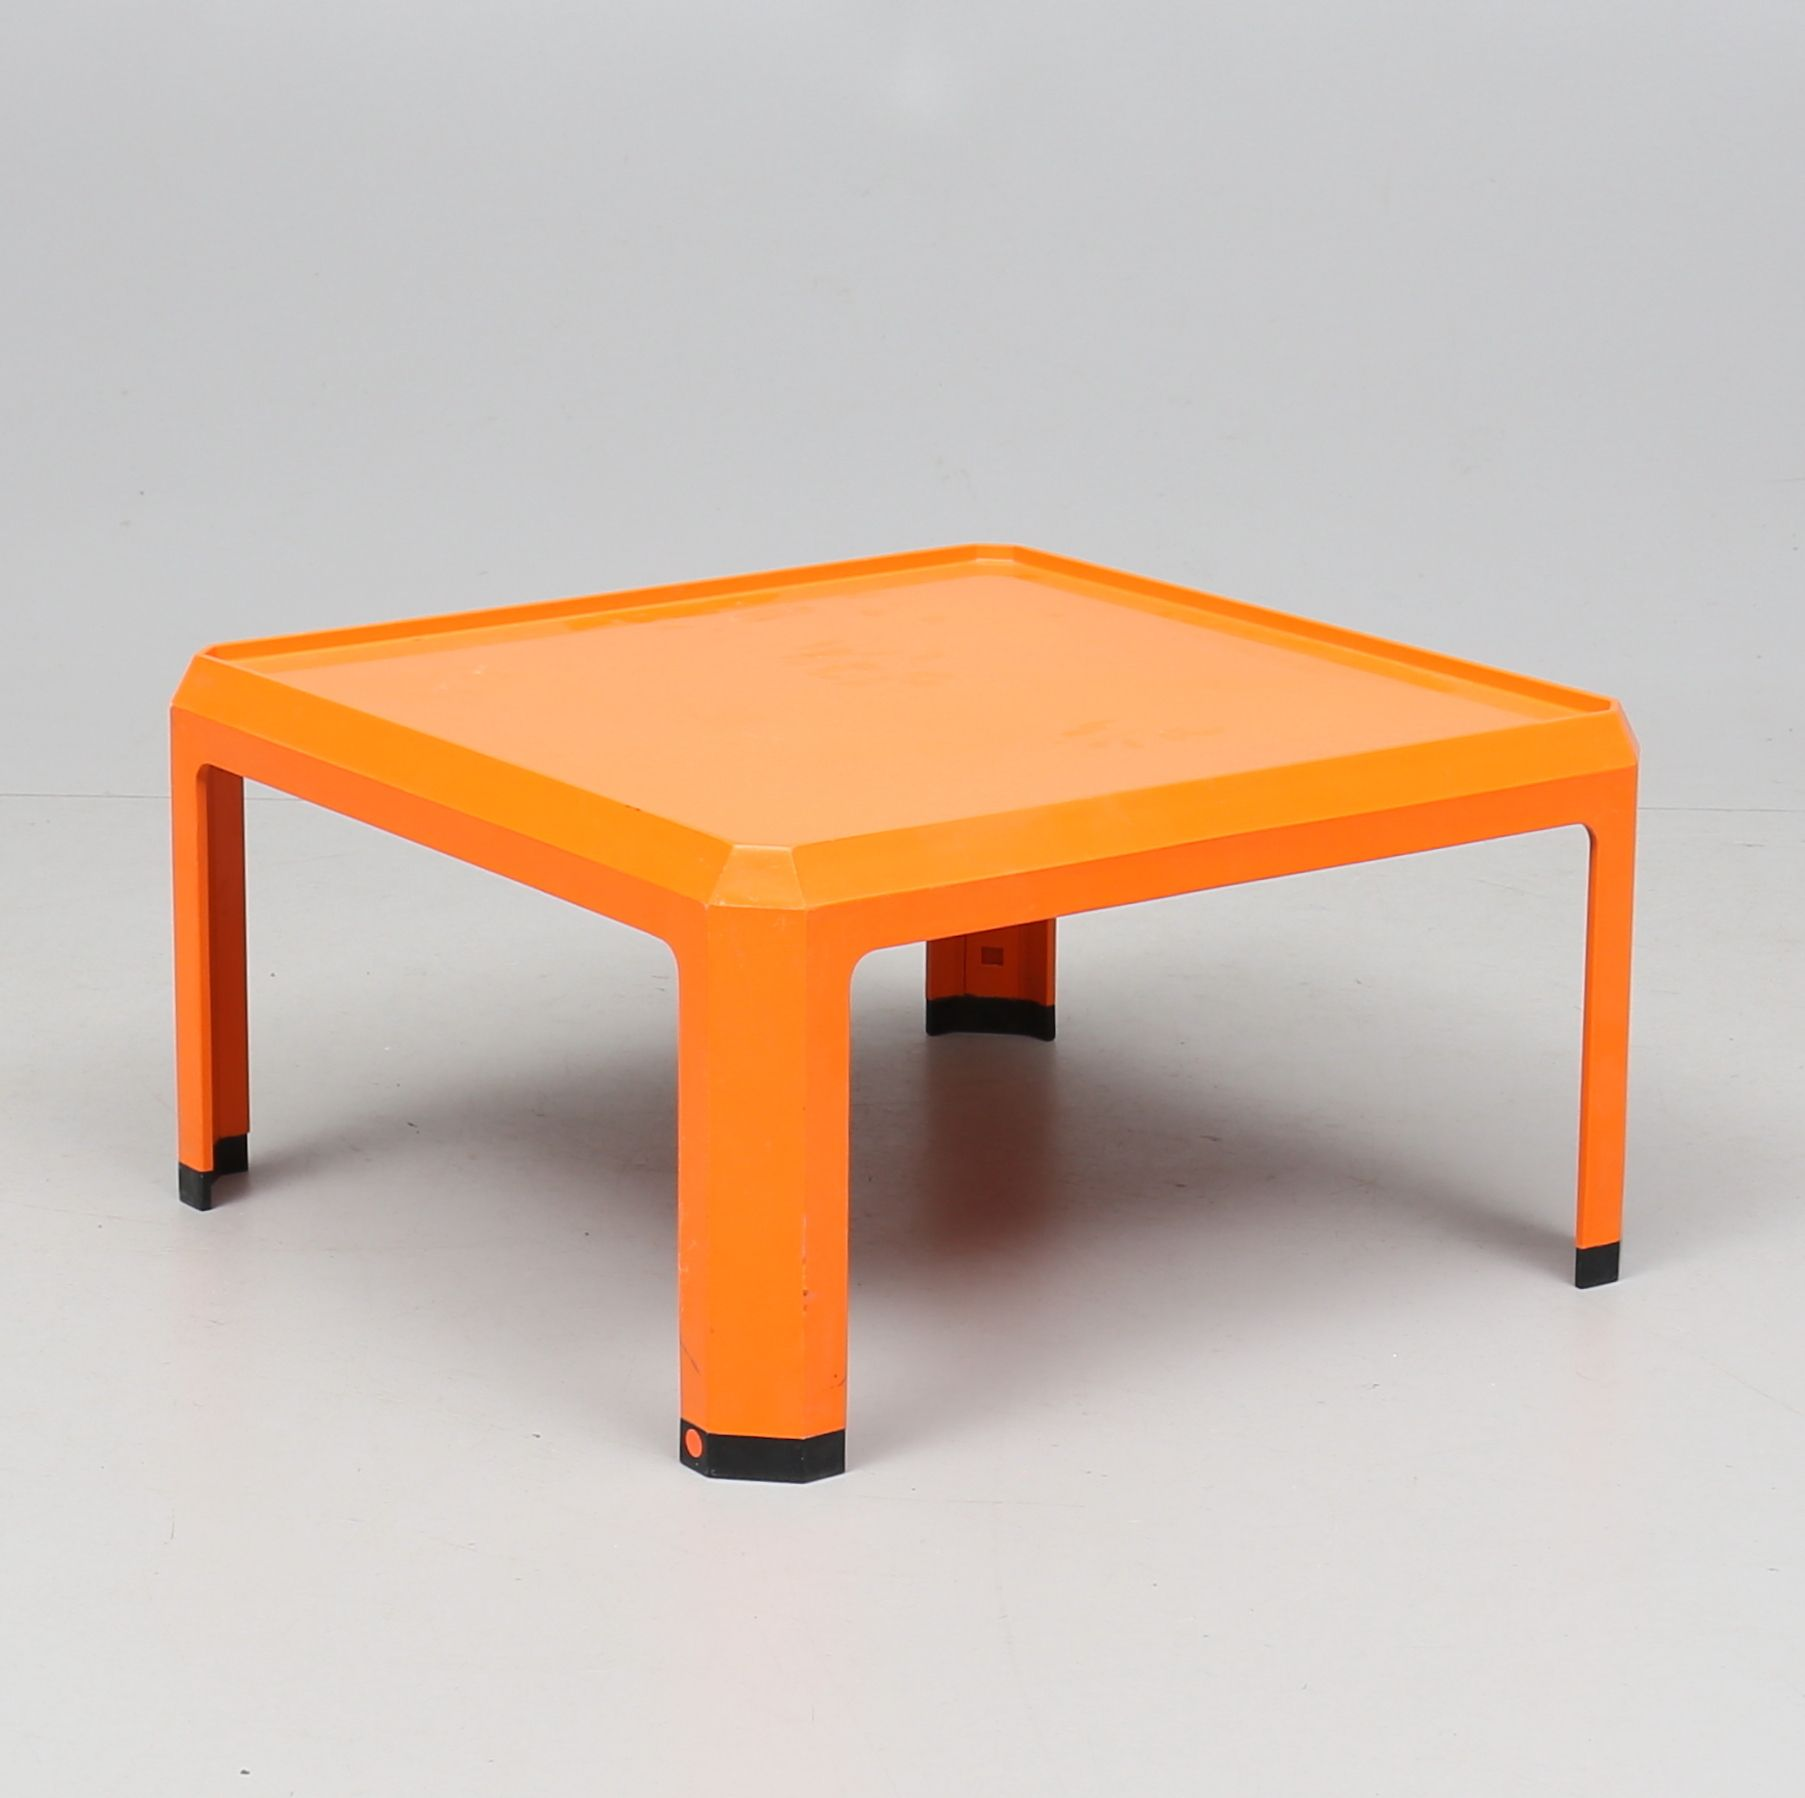 Alberto Rosselli Kartell Italy 1969 Table Design Home Decor [ 1798 x 1805 Pixel ]